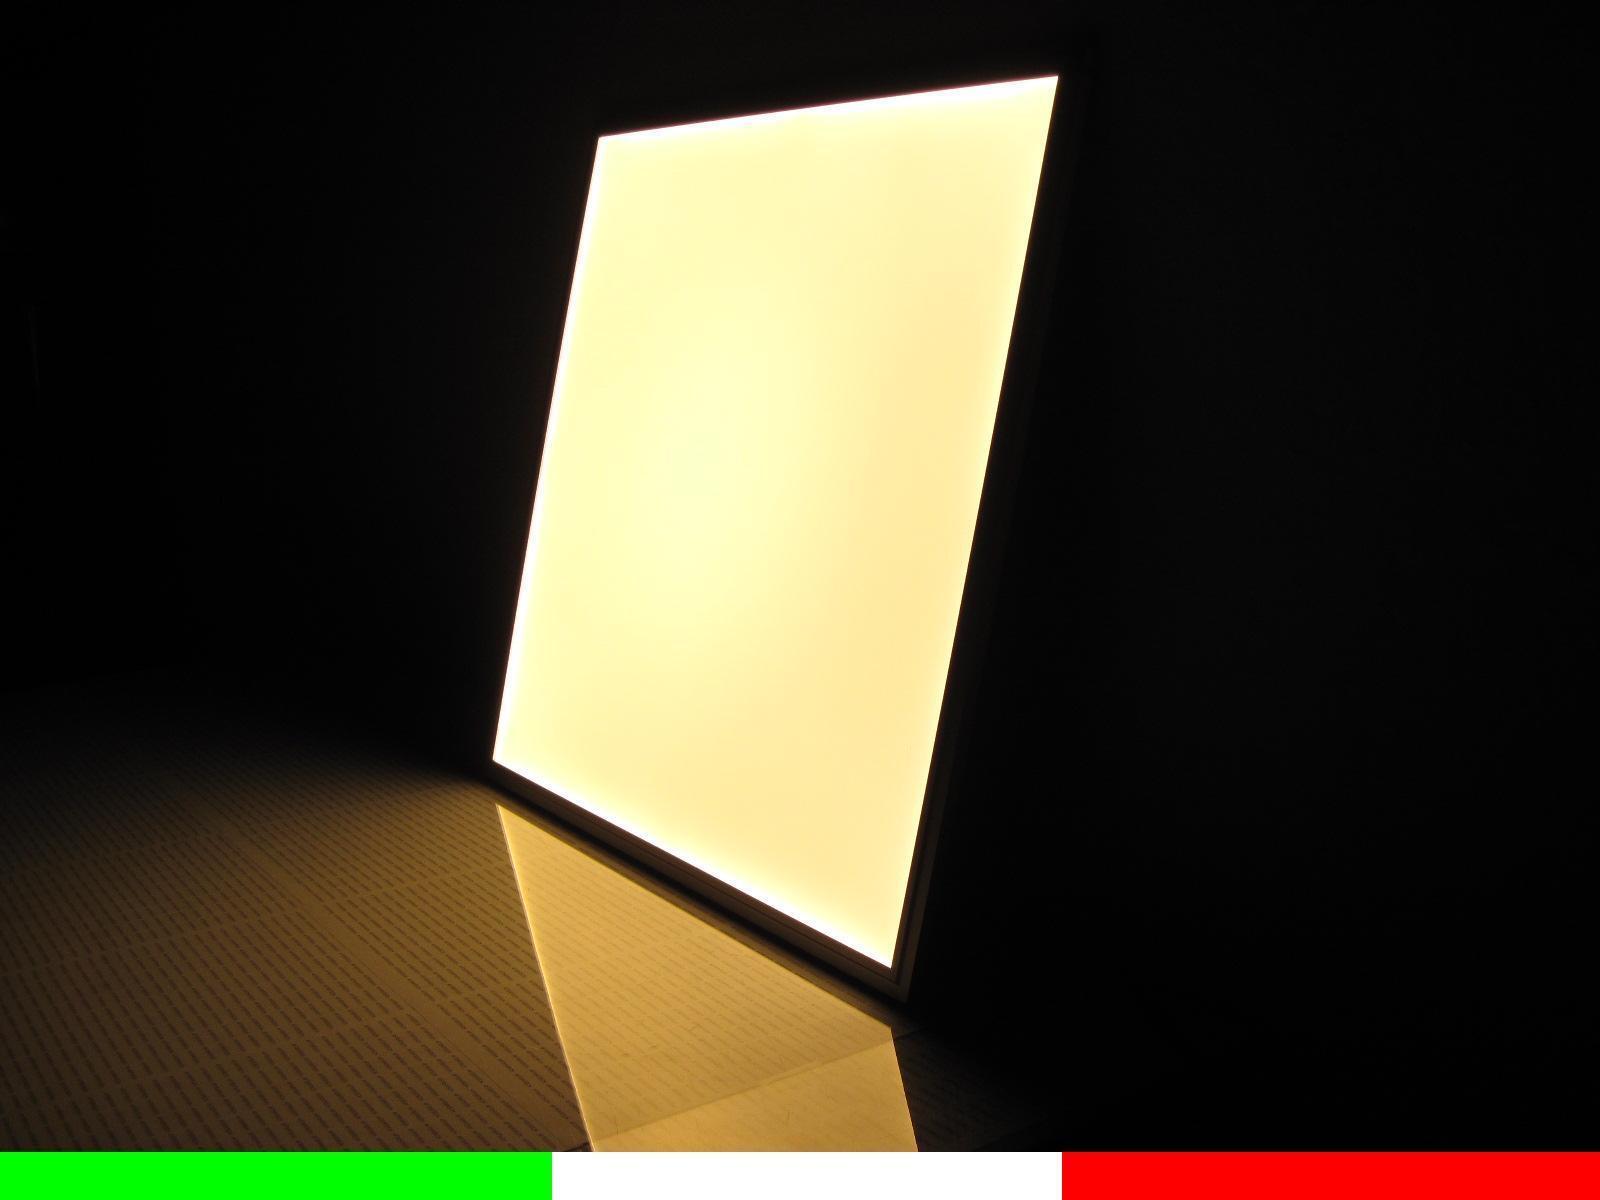 Plafoniera Led Luce Fredda : Pannello plafoniera led 42w 60x60 cm lampada soffitto bianco caldo